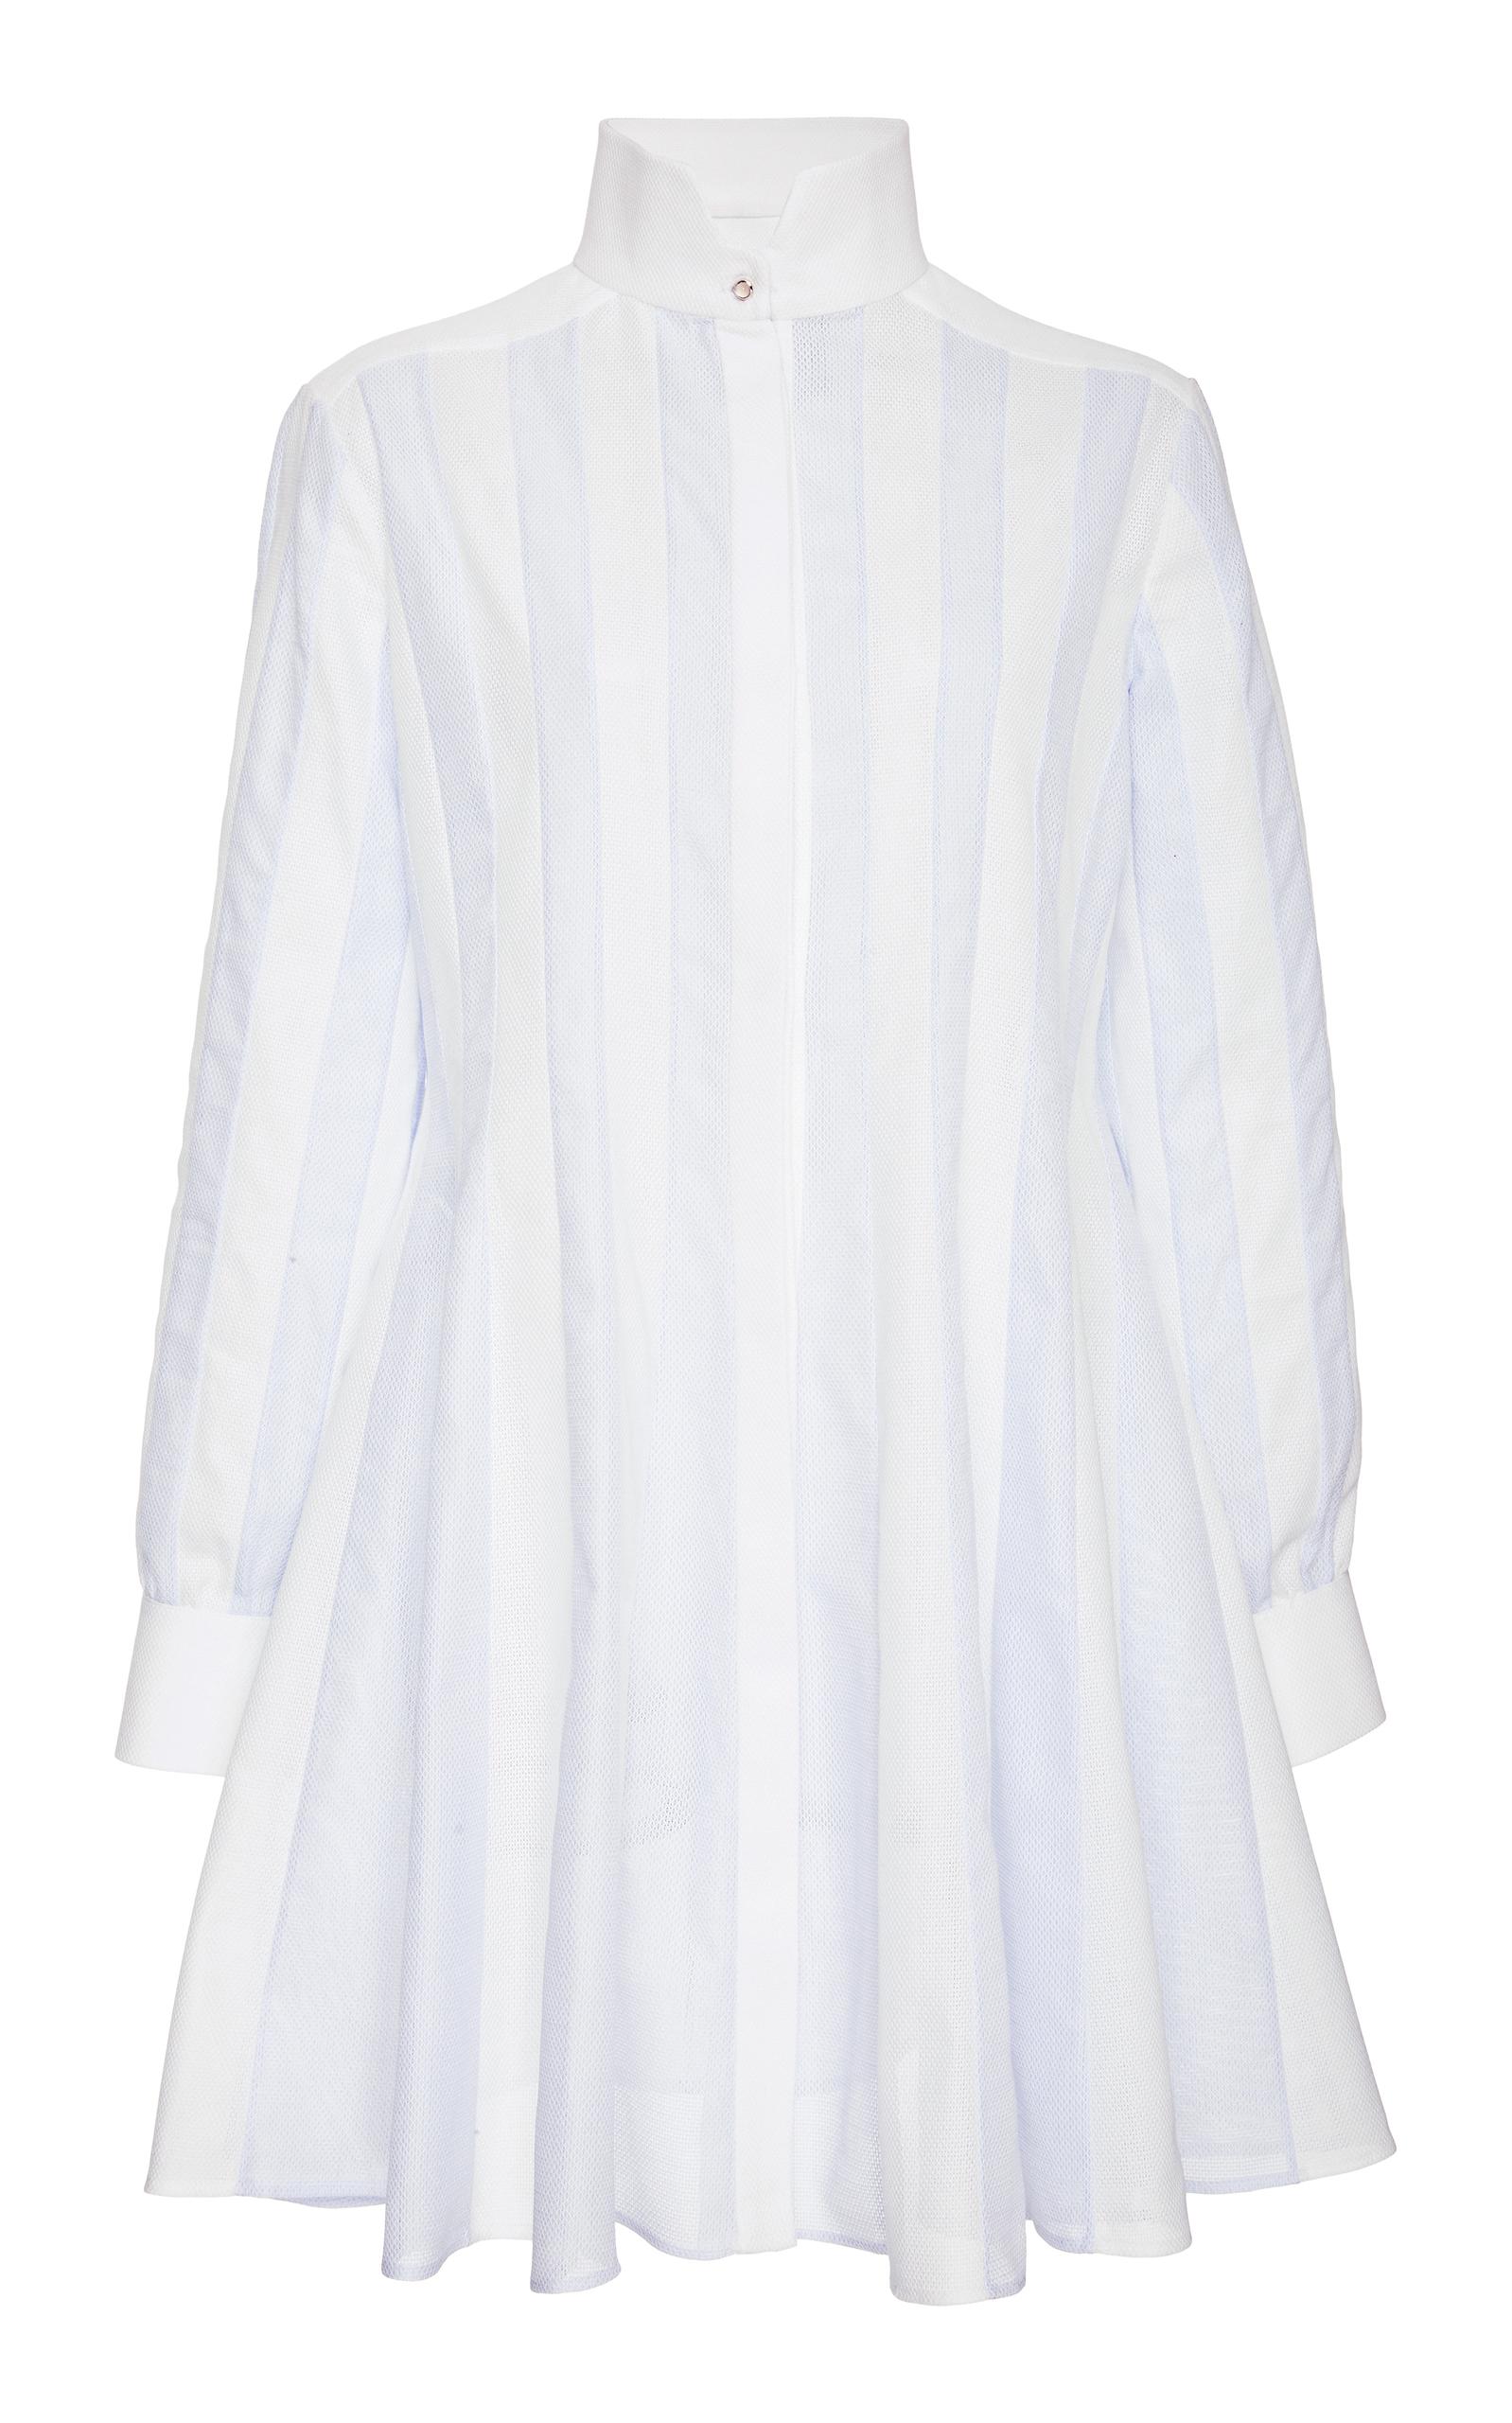 ESME VIE M'O EXCLUSIVE SANTORINI STRIPED DRESS